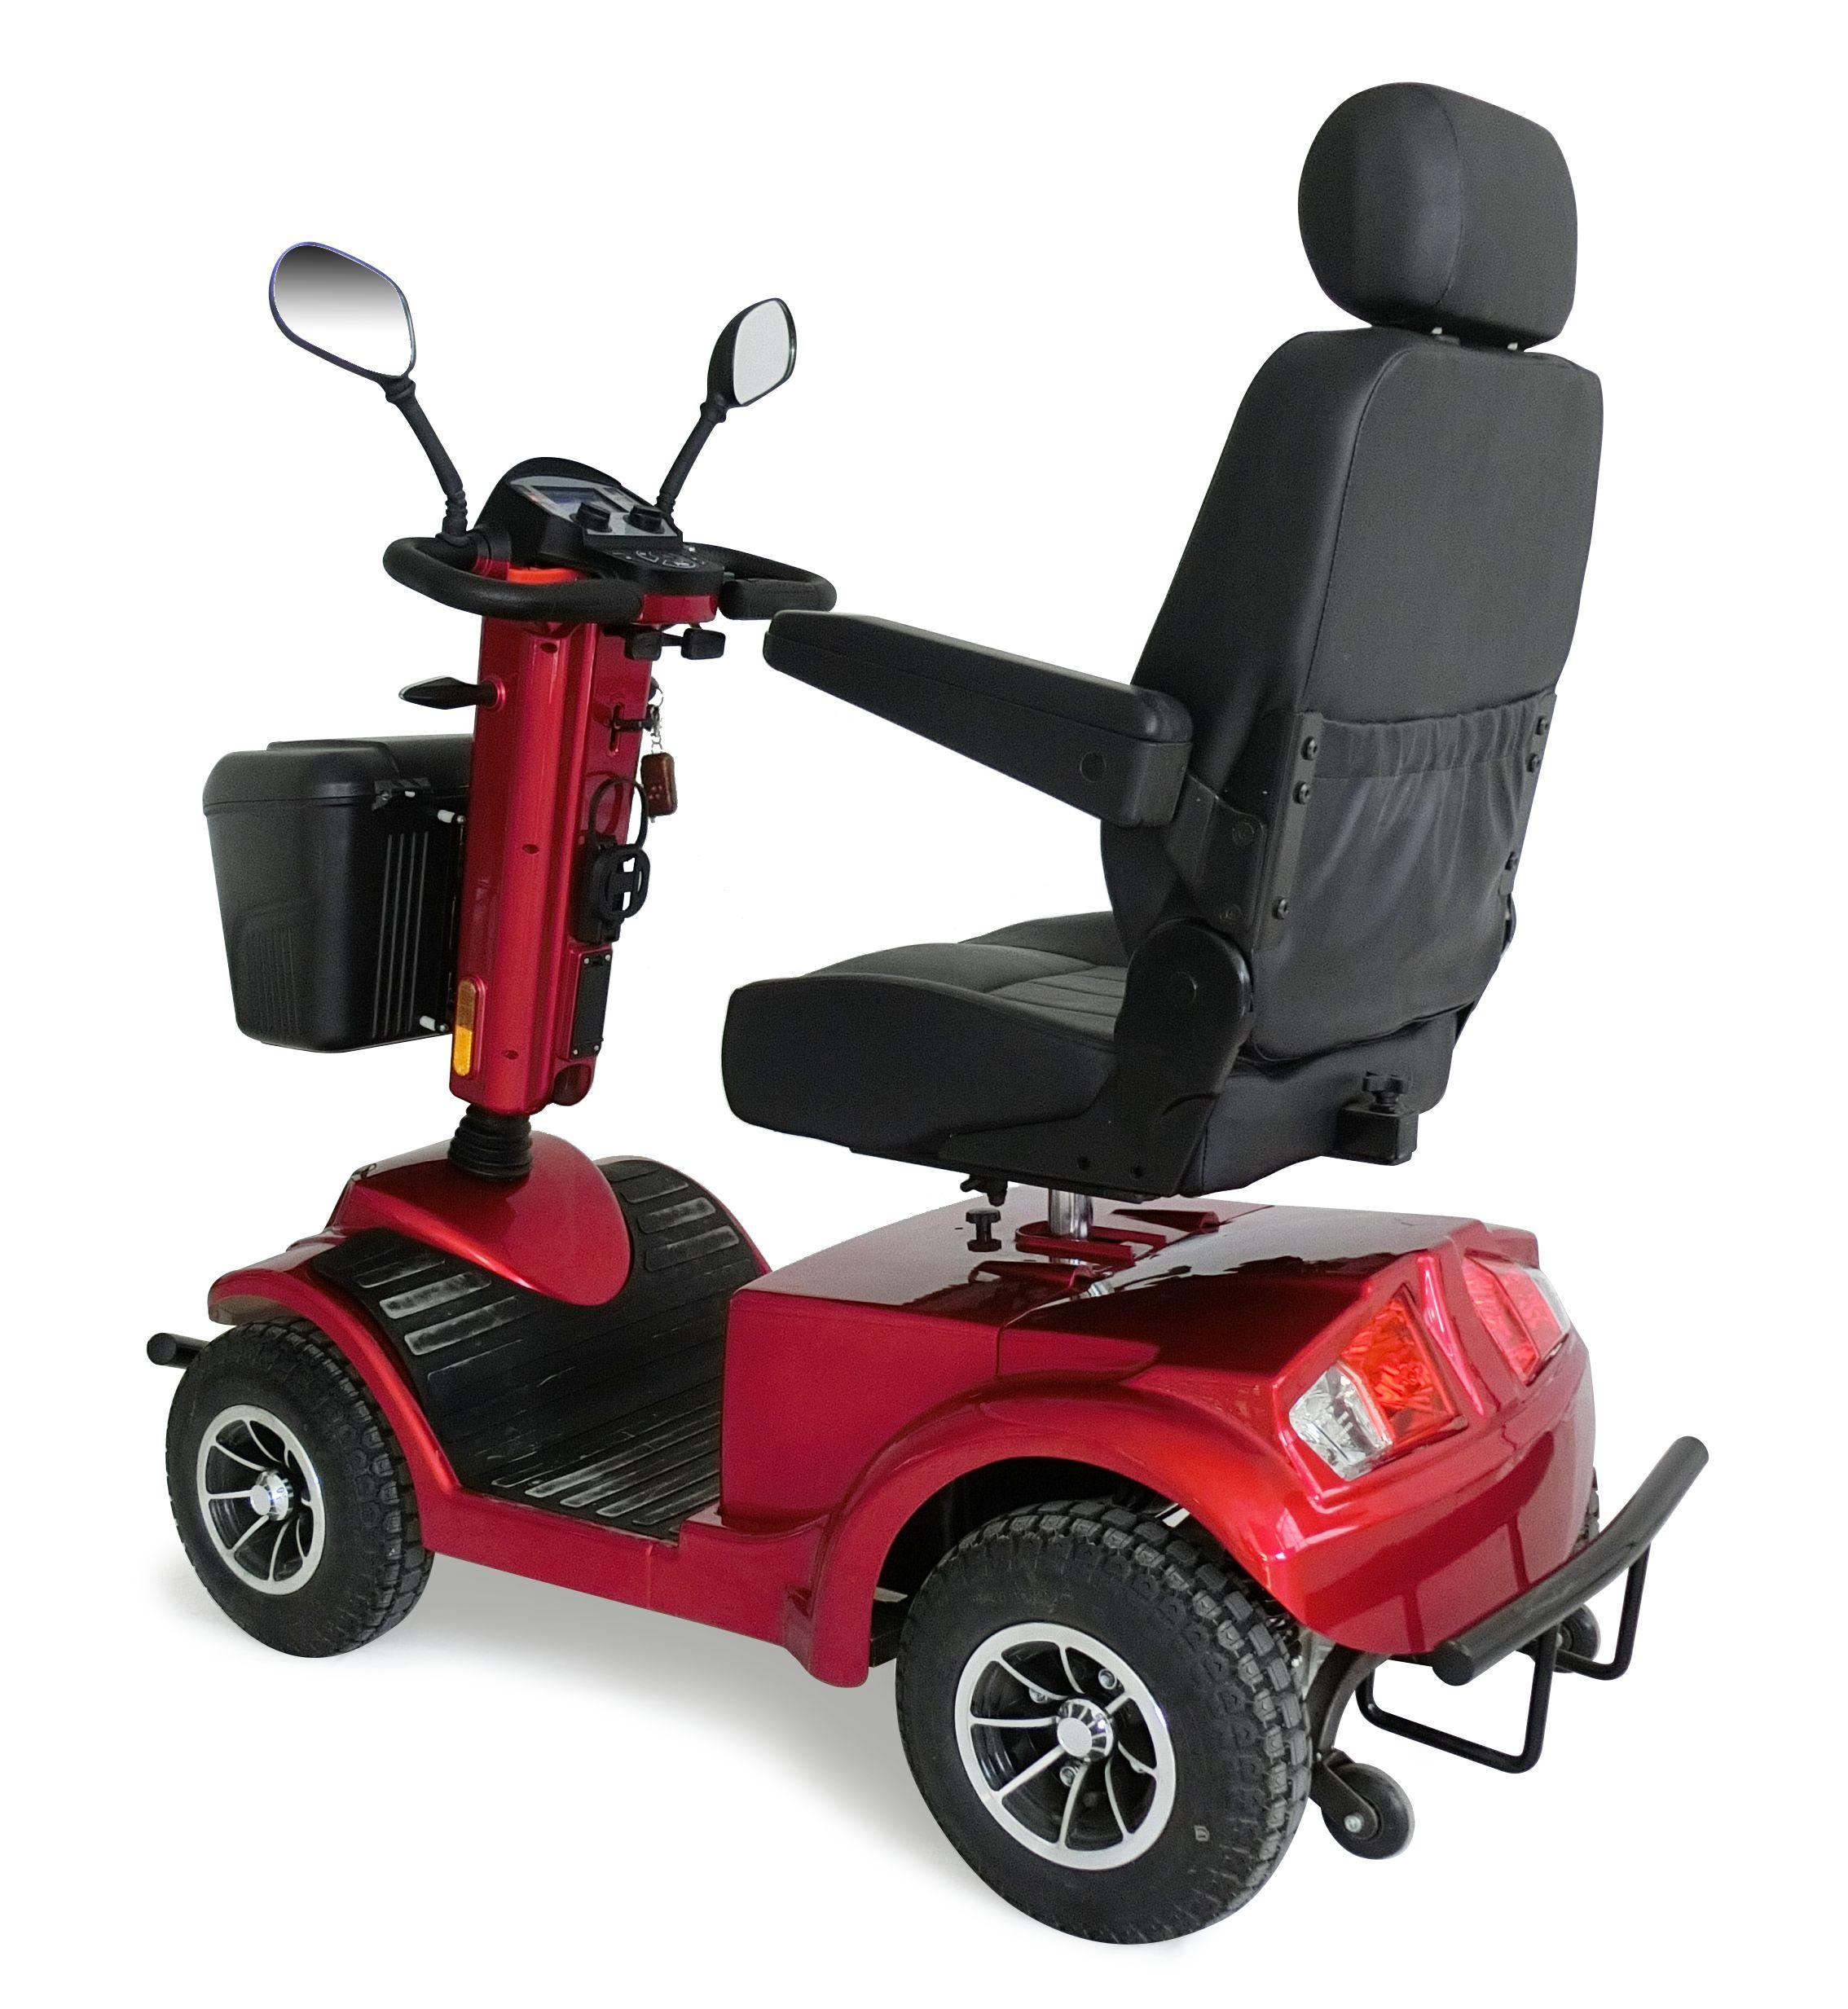 scooter per disabili kometa luxor mediland